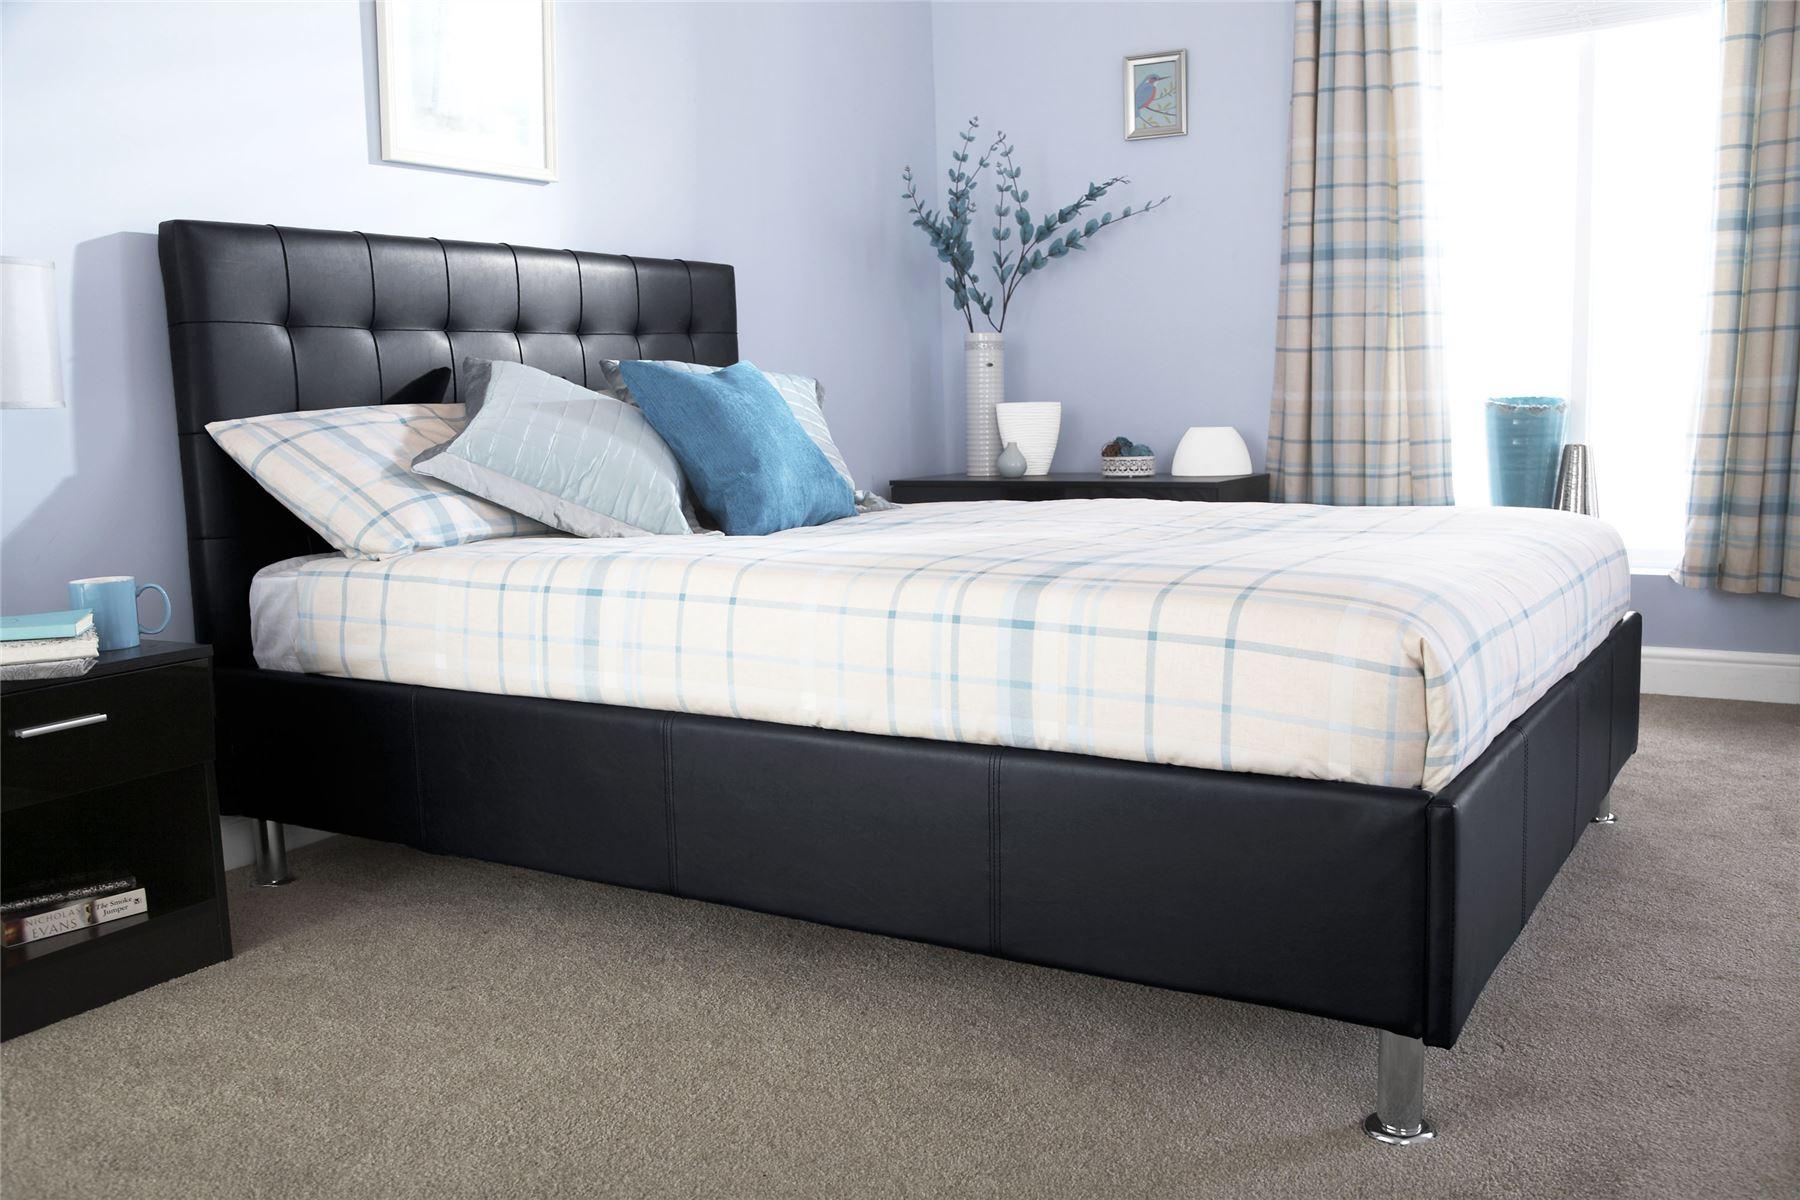 Naples Faux Leather Bedstead Modern Elegant Bed Chrome